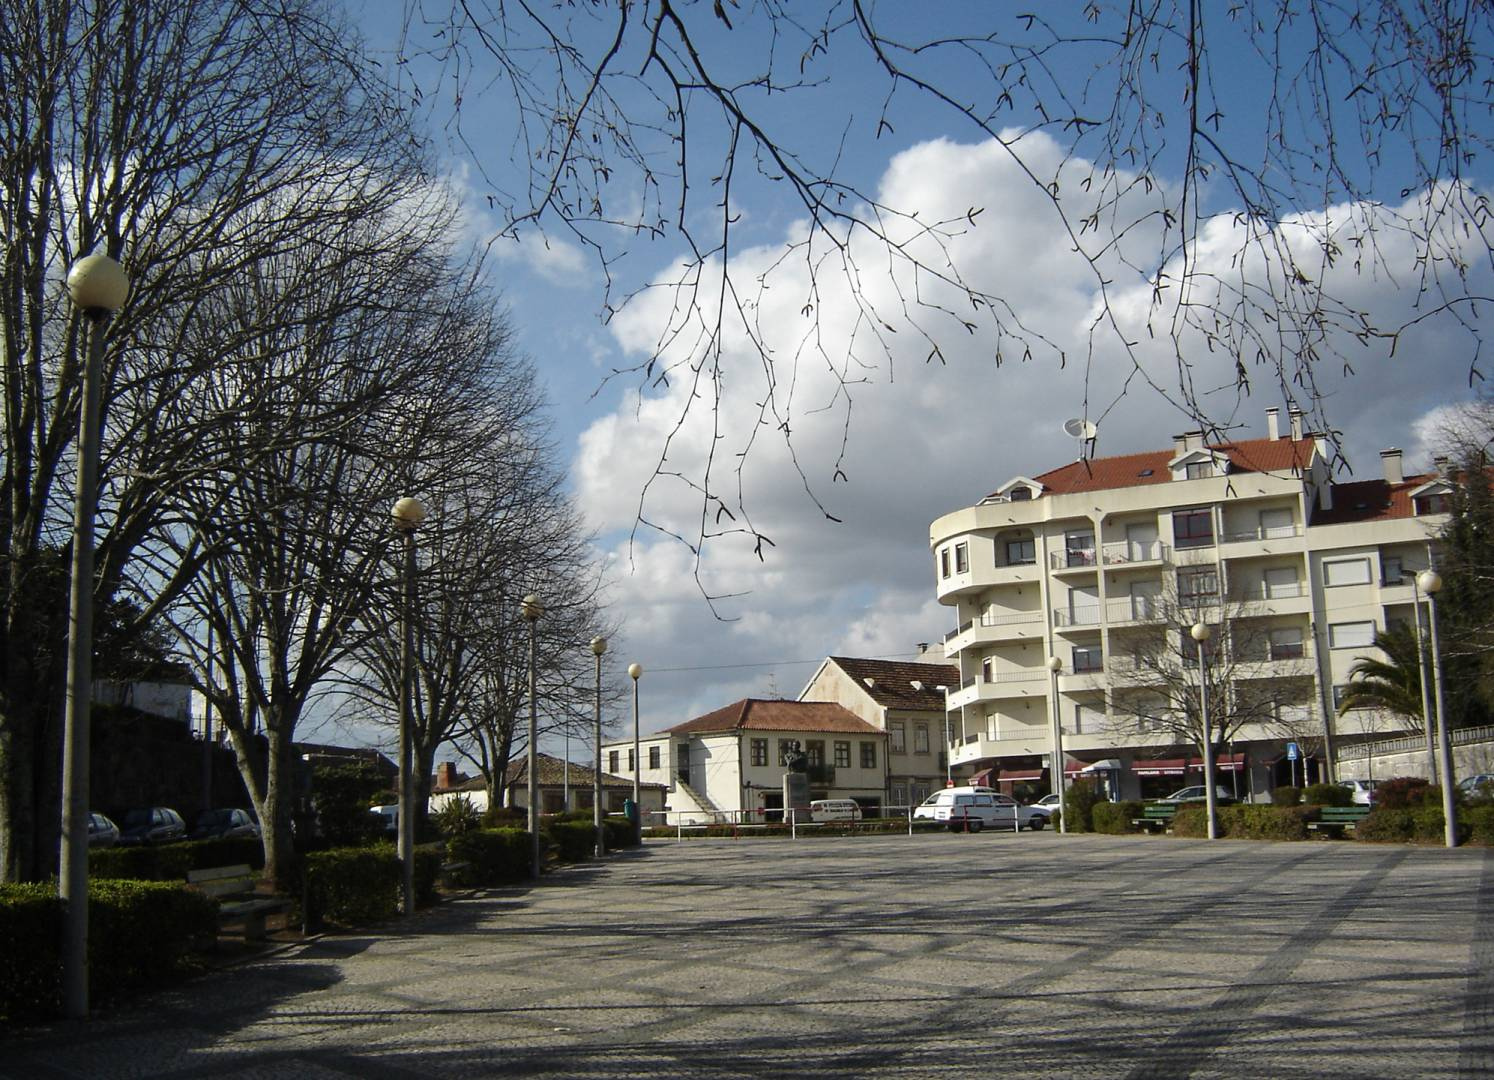 Jardim da Alameda Luís de Camões